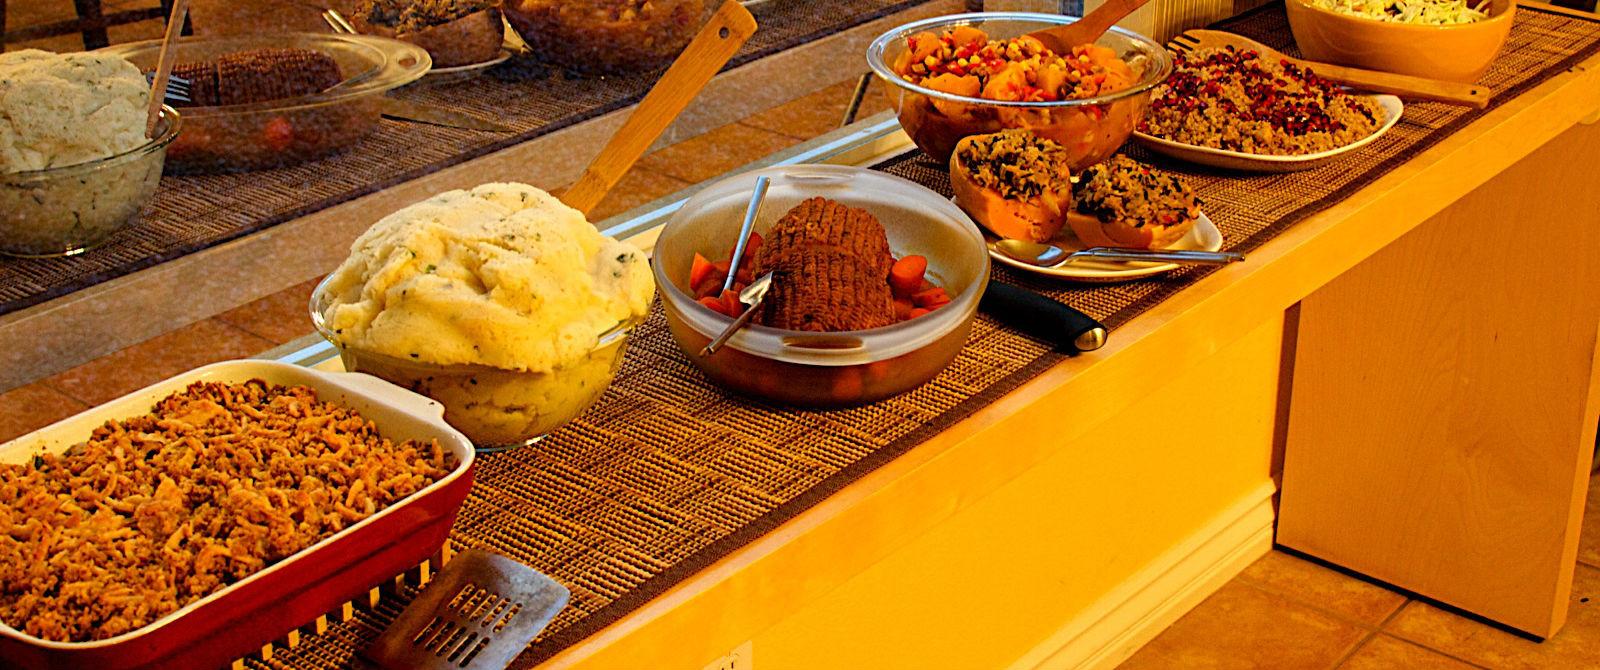 Vegan Thanksgiving Dinner  How To Cook A Vegan Thanksgiving Dinner Your Family Will Love